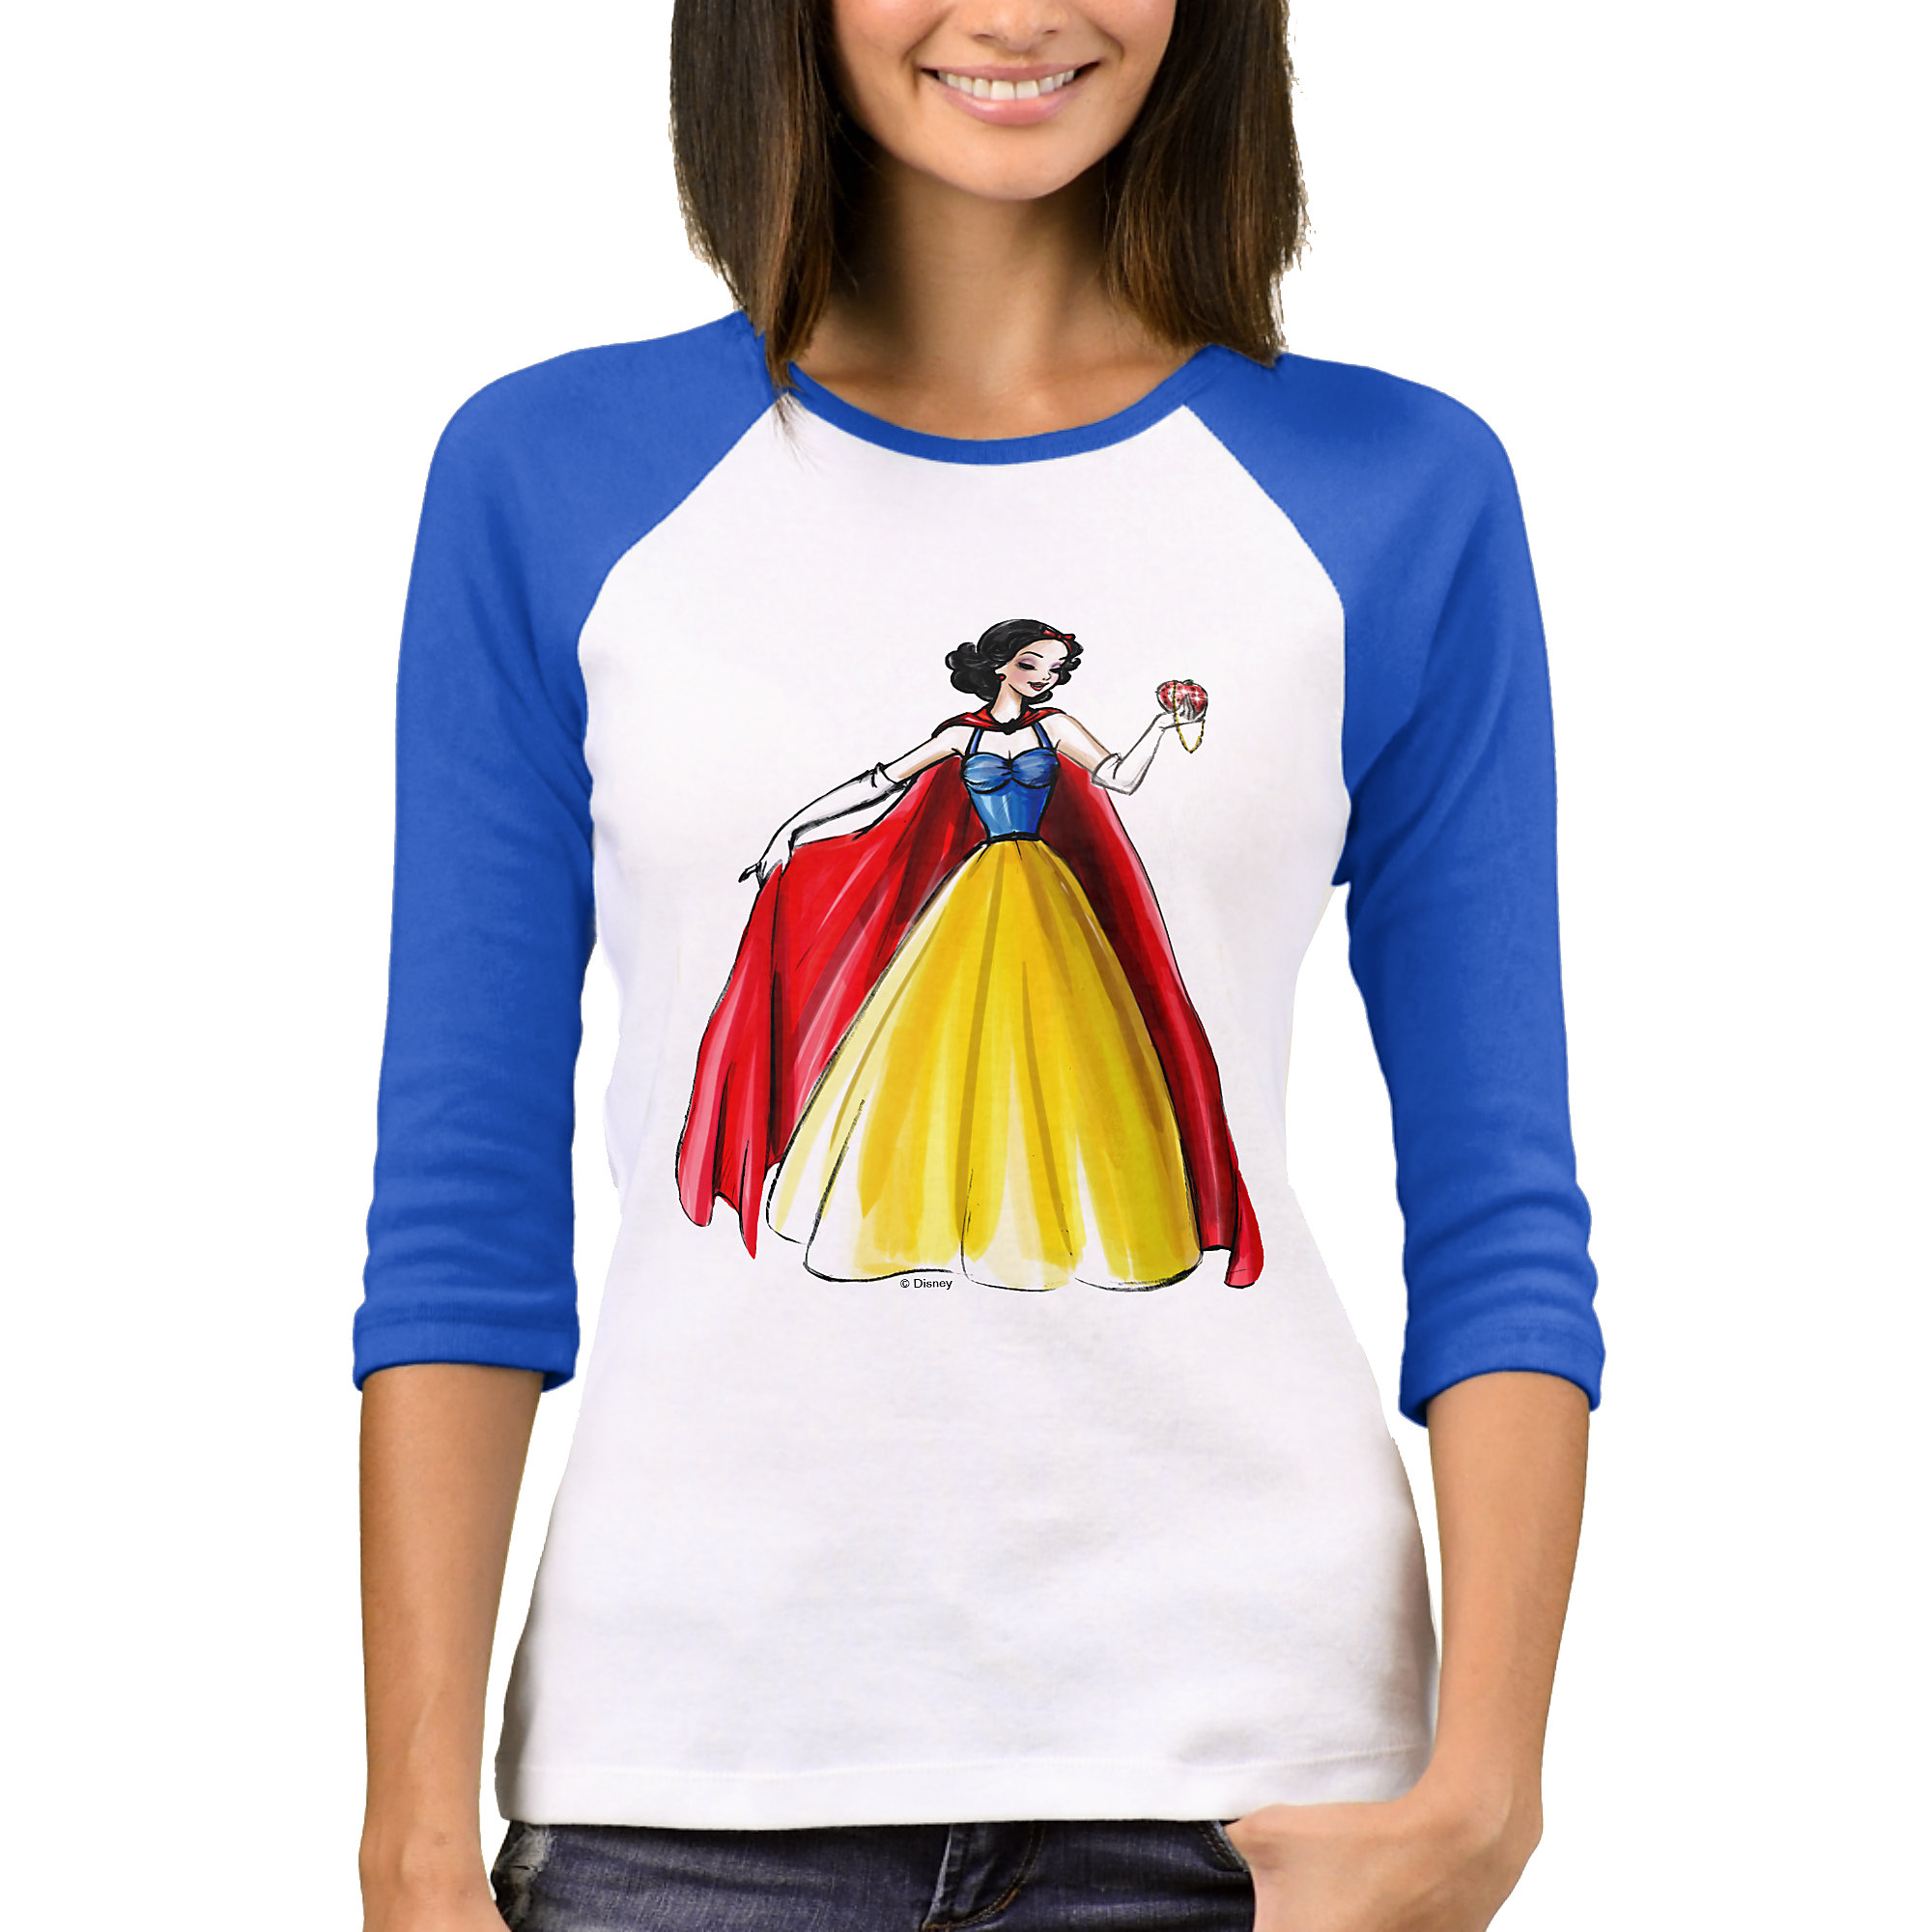 Snow White Raglan T-Shirt - Art of Princess Designer Collection